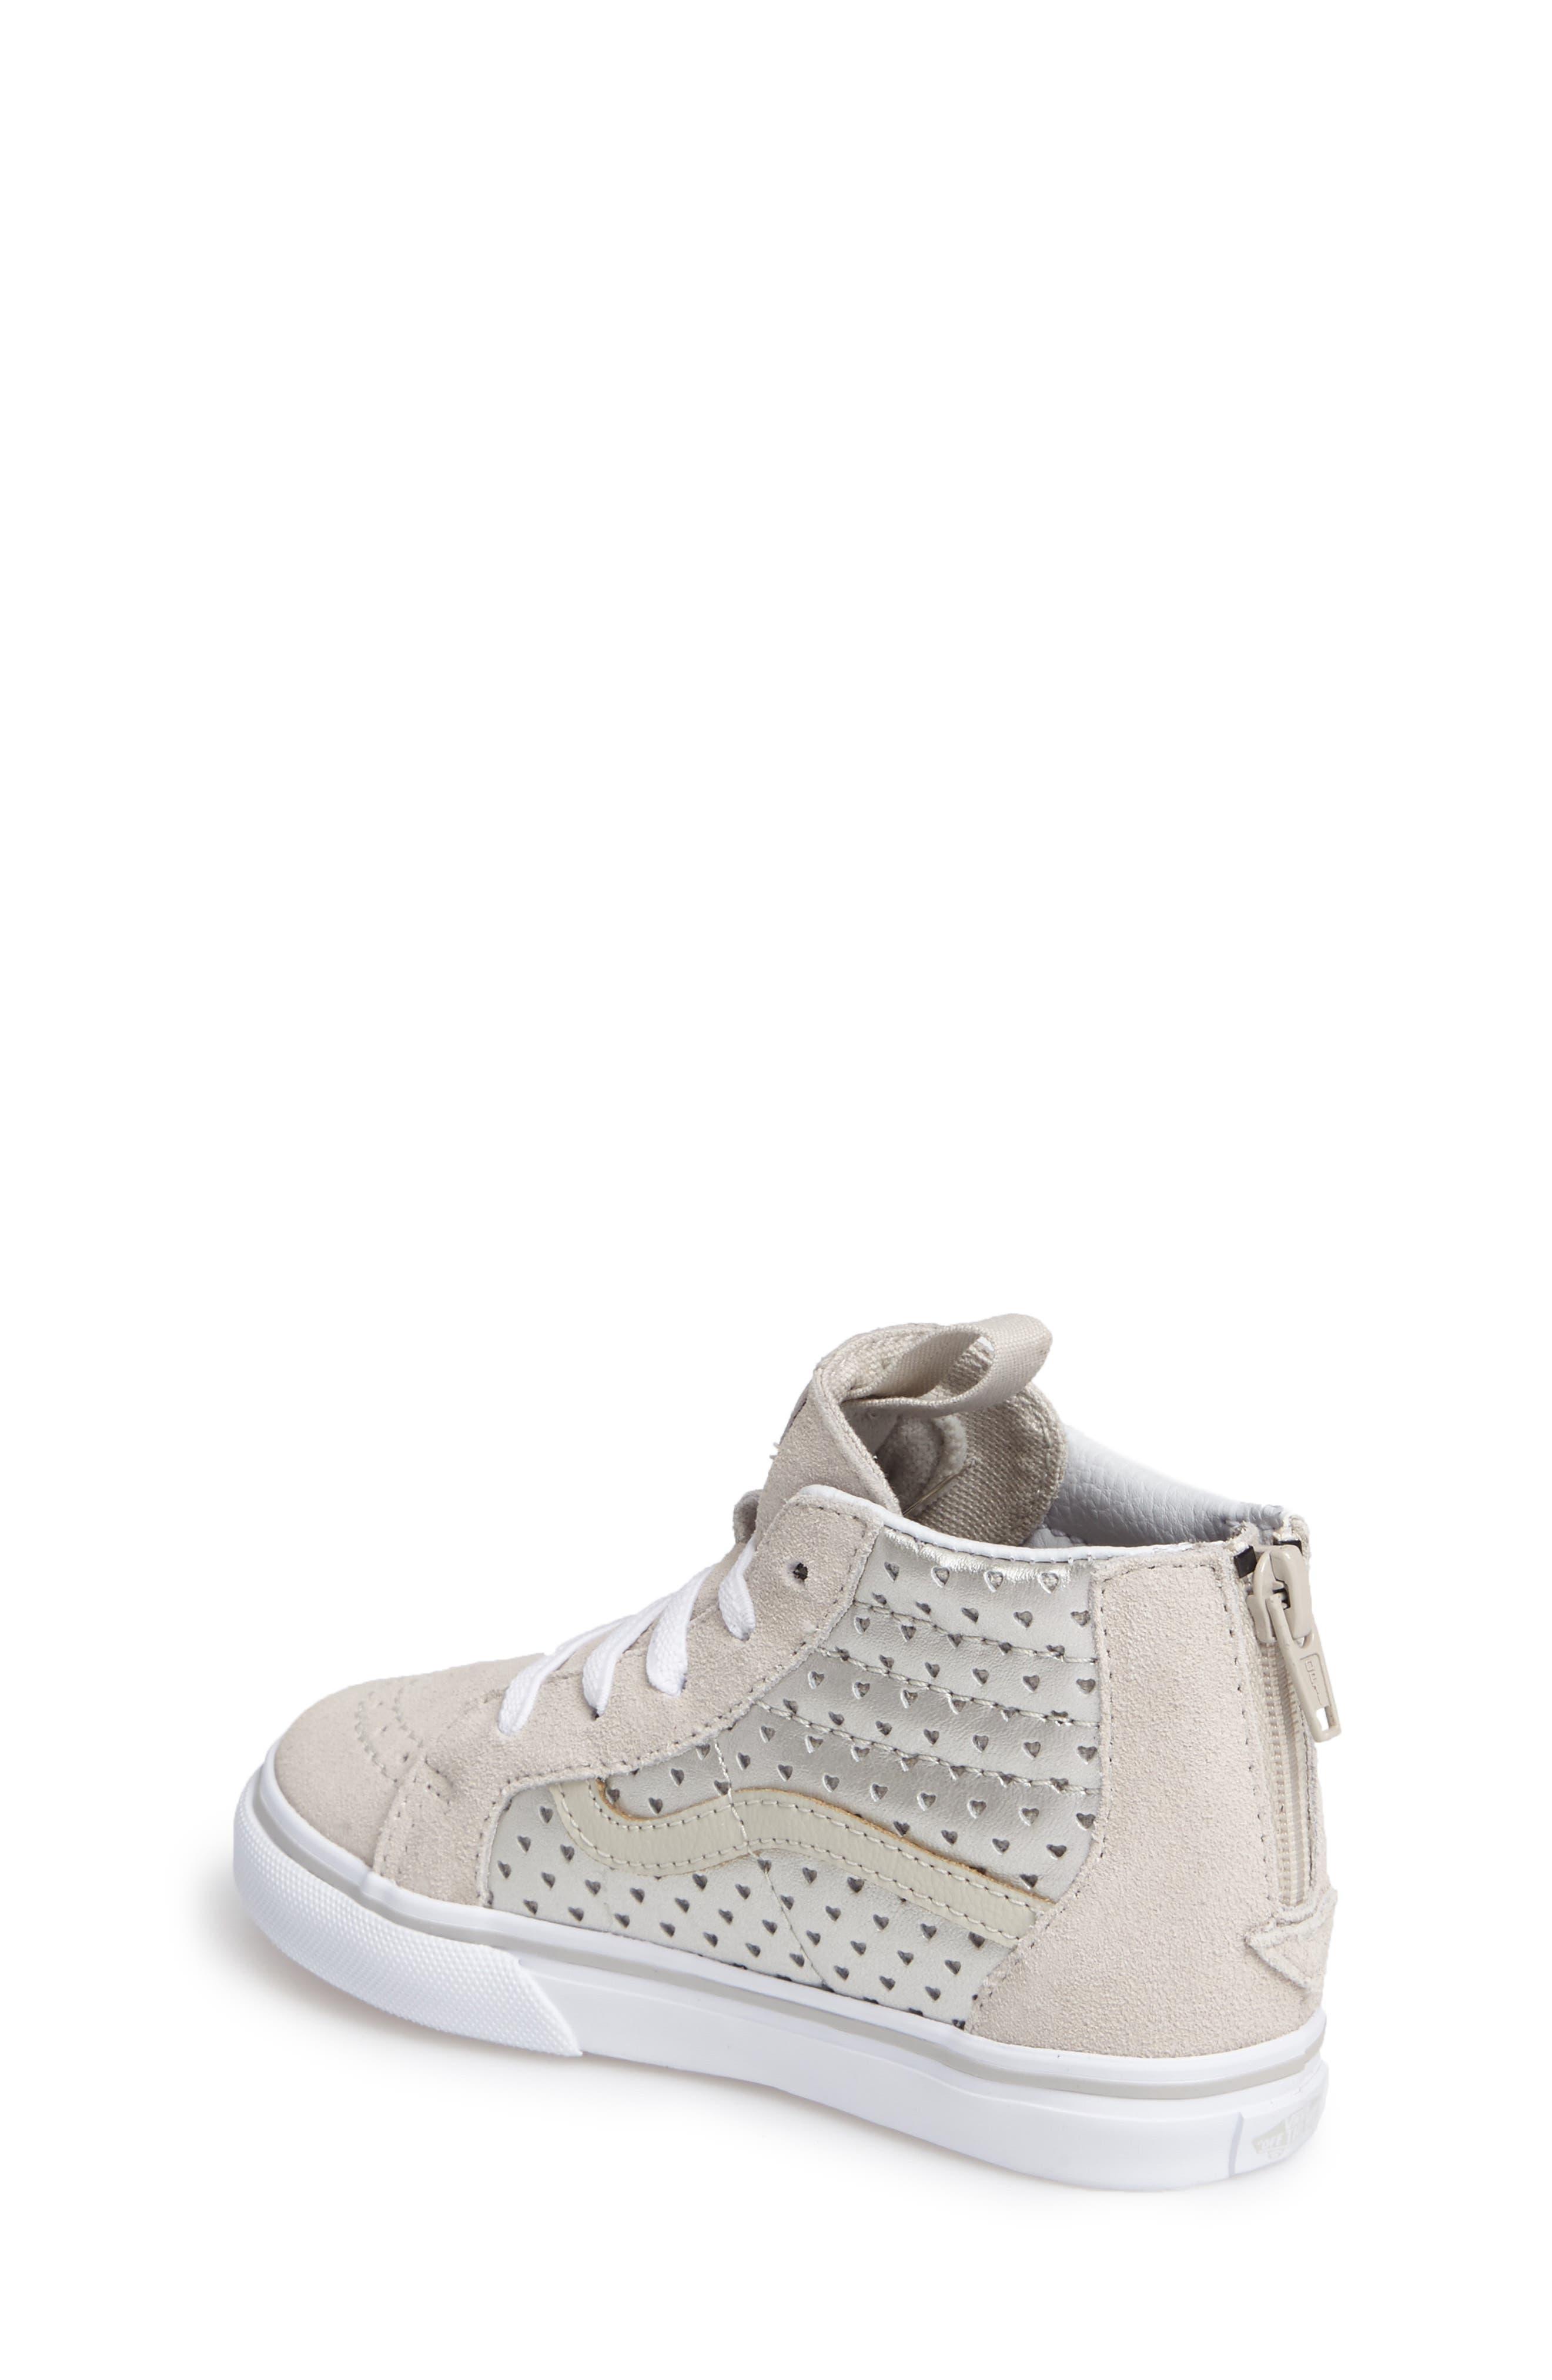 Alternate Image 2  - Vans Sk8-Hi Zip Sneaker (Baby, Walker, Toddler, Little Kid & Big Kid)